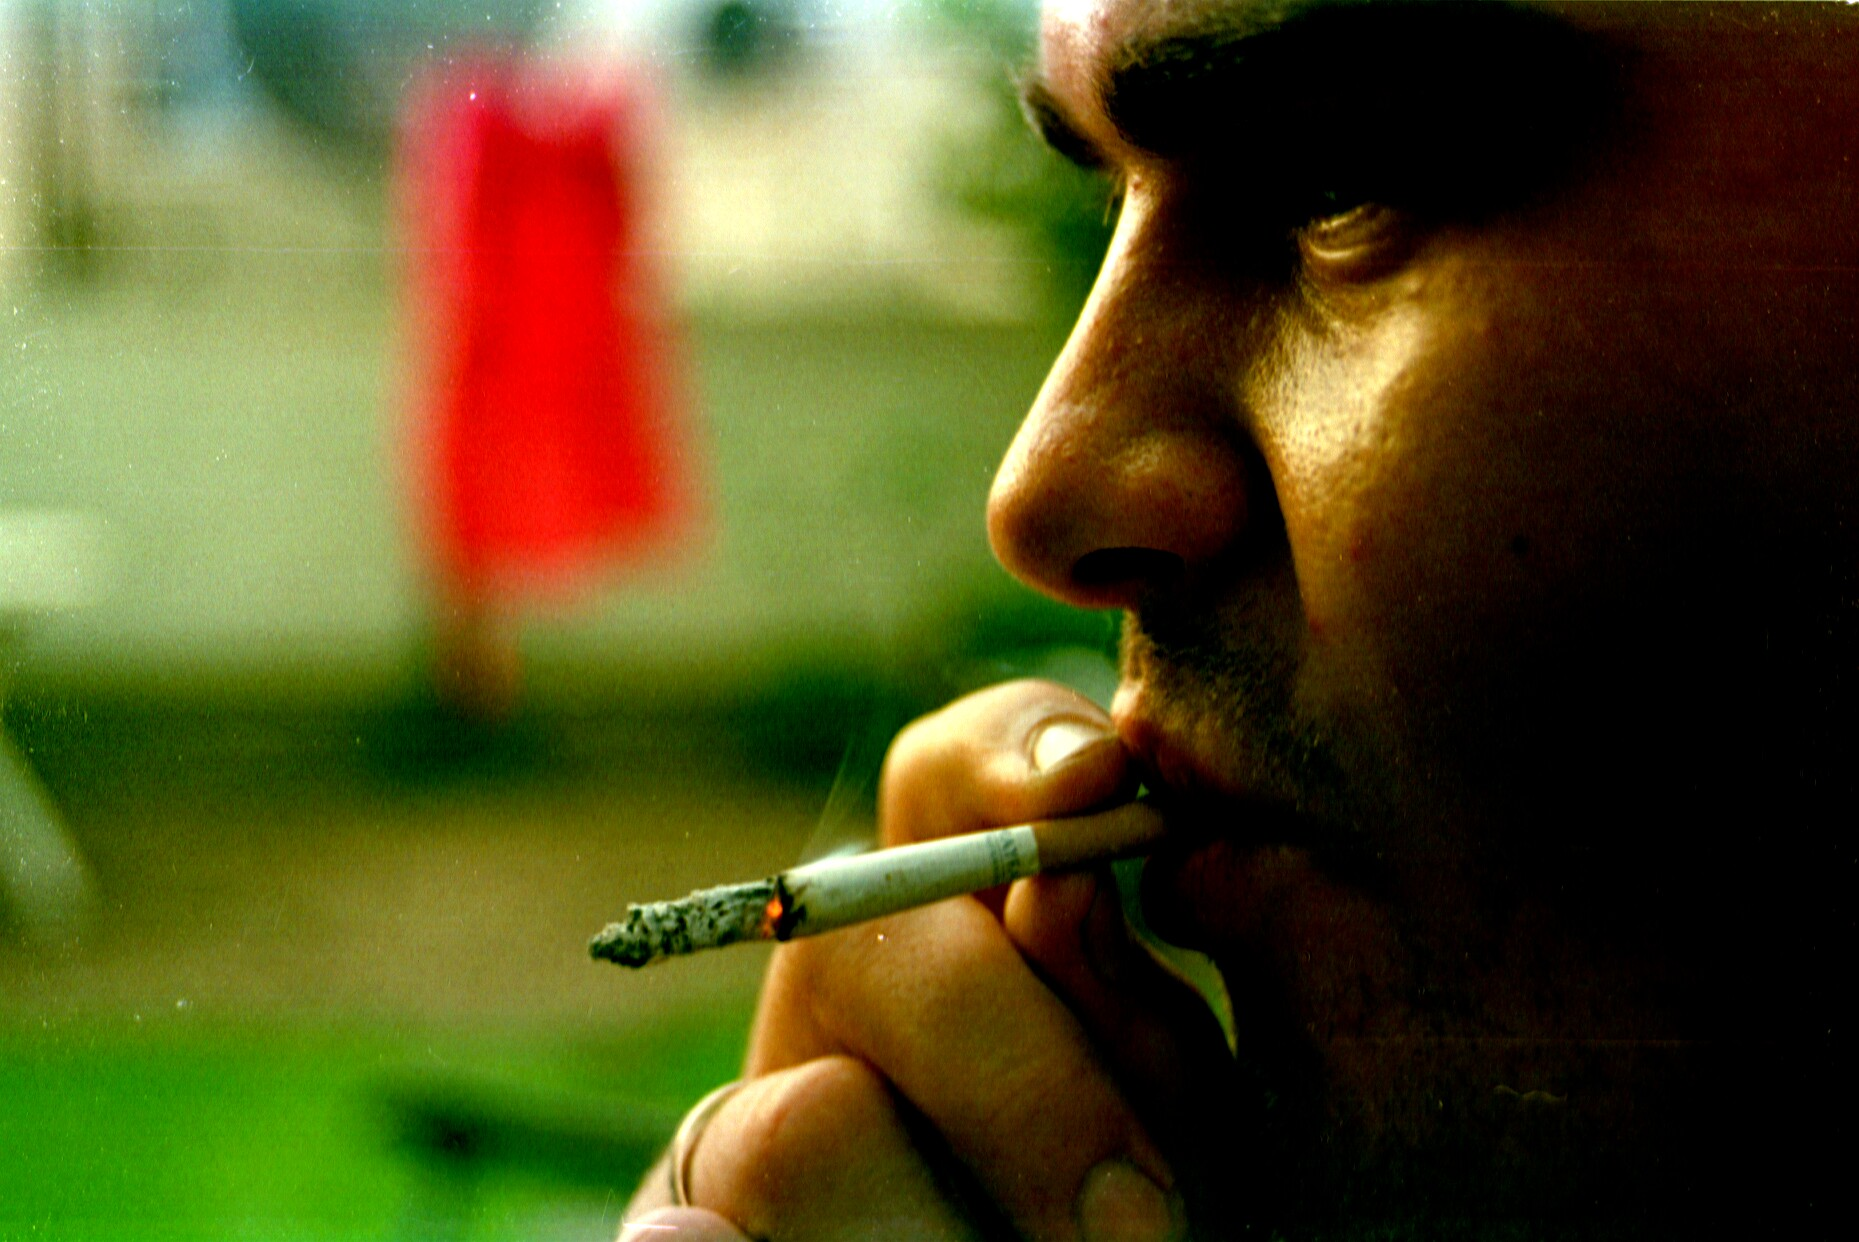 Smoker closeup